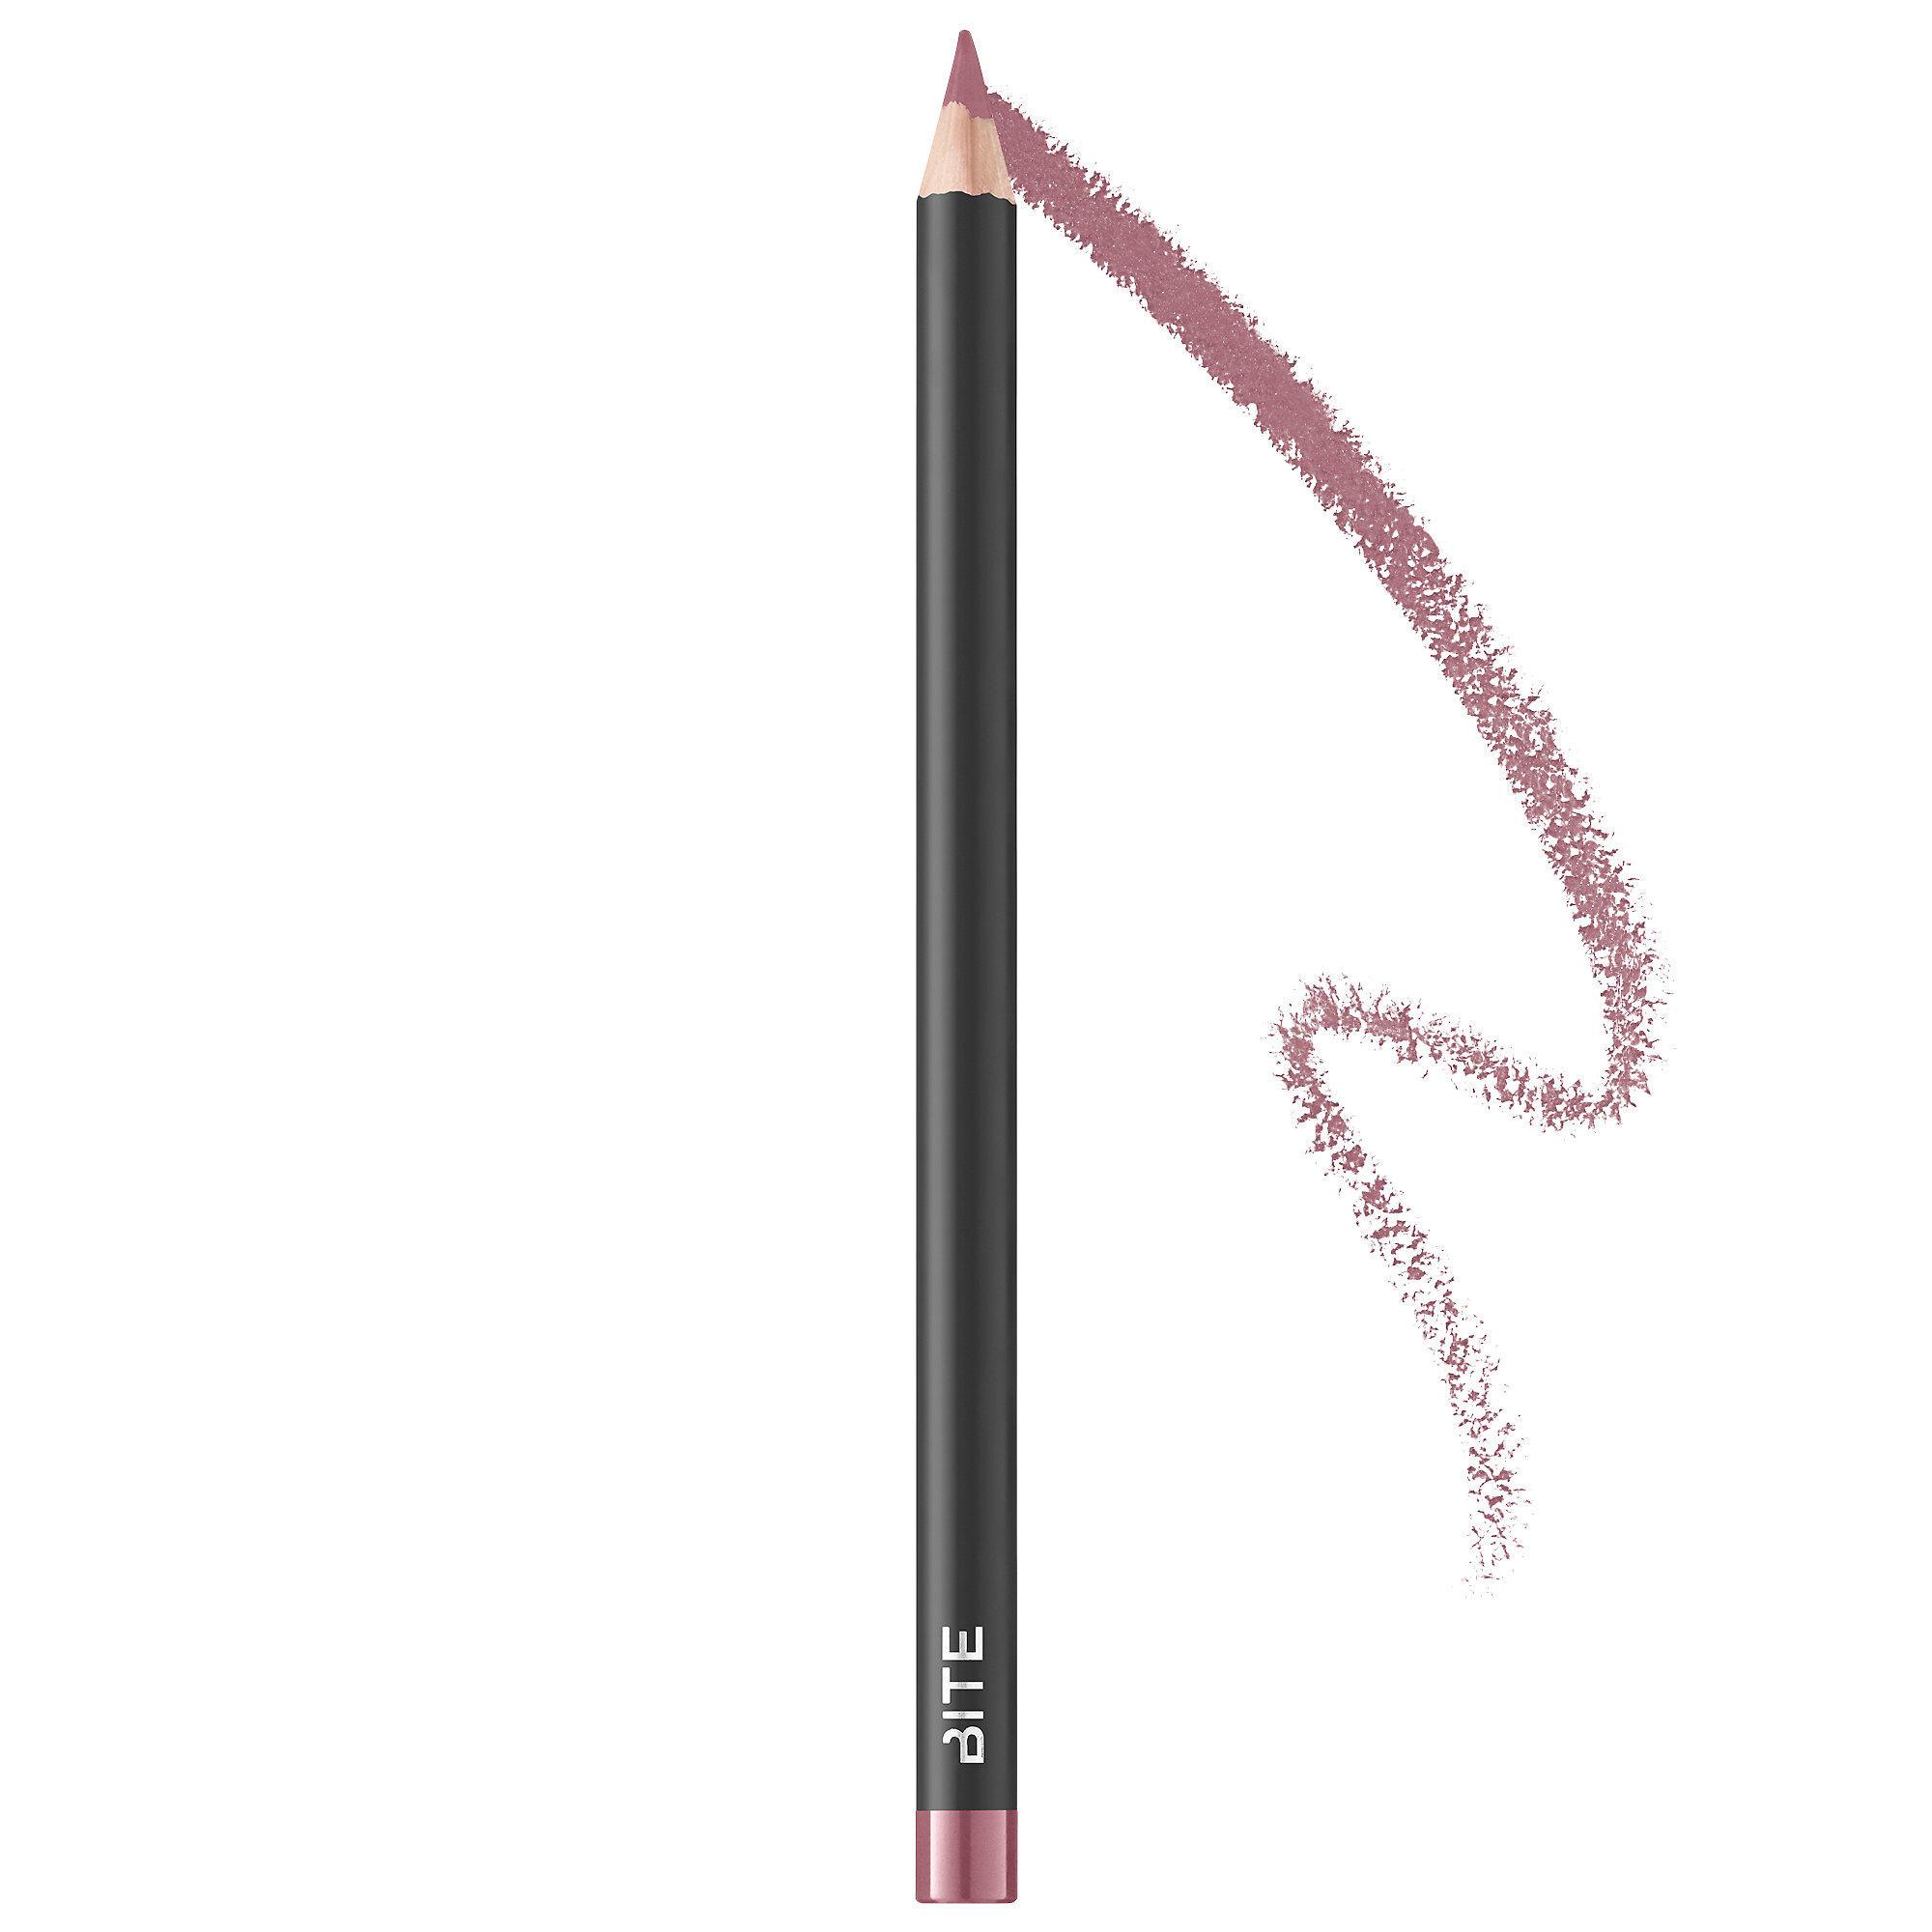 Bite Beauty The Lip Pencil Rosey Mauve 010